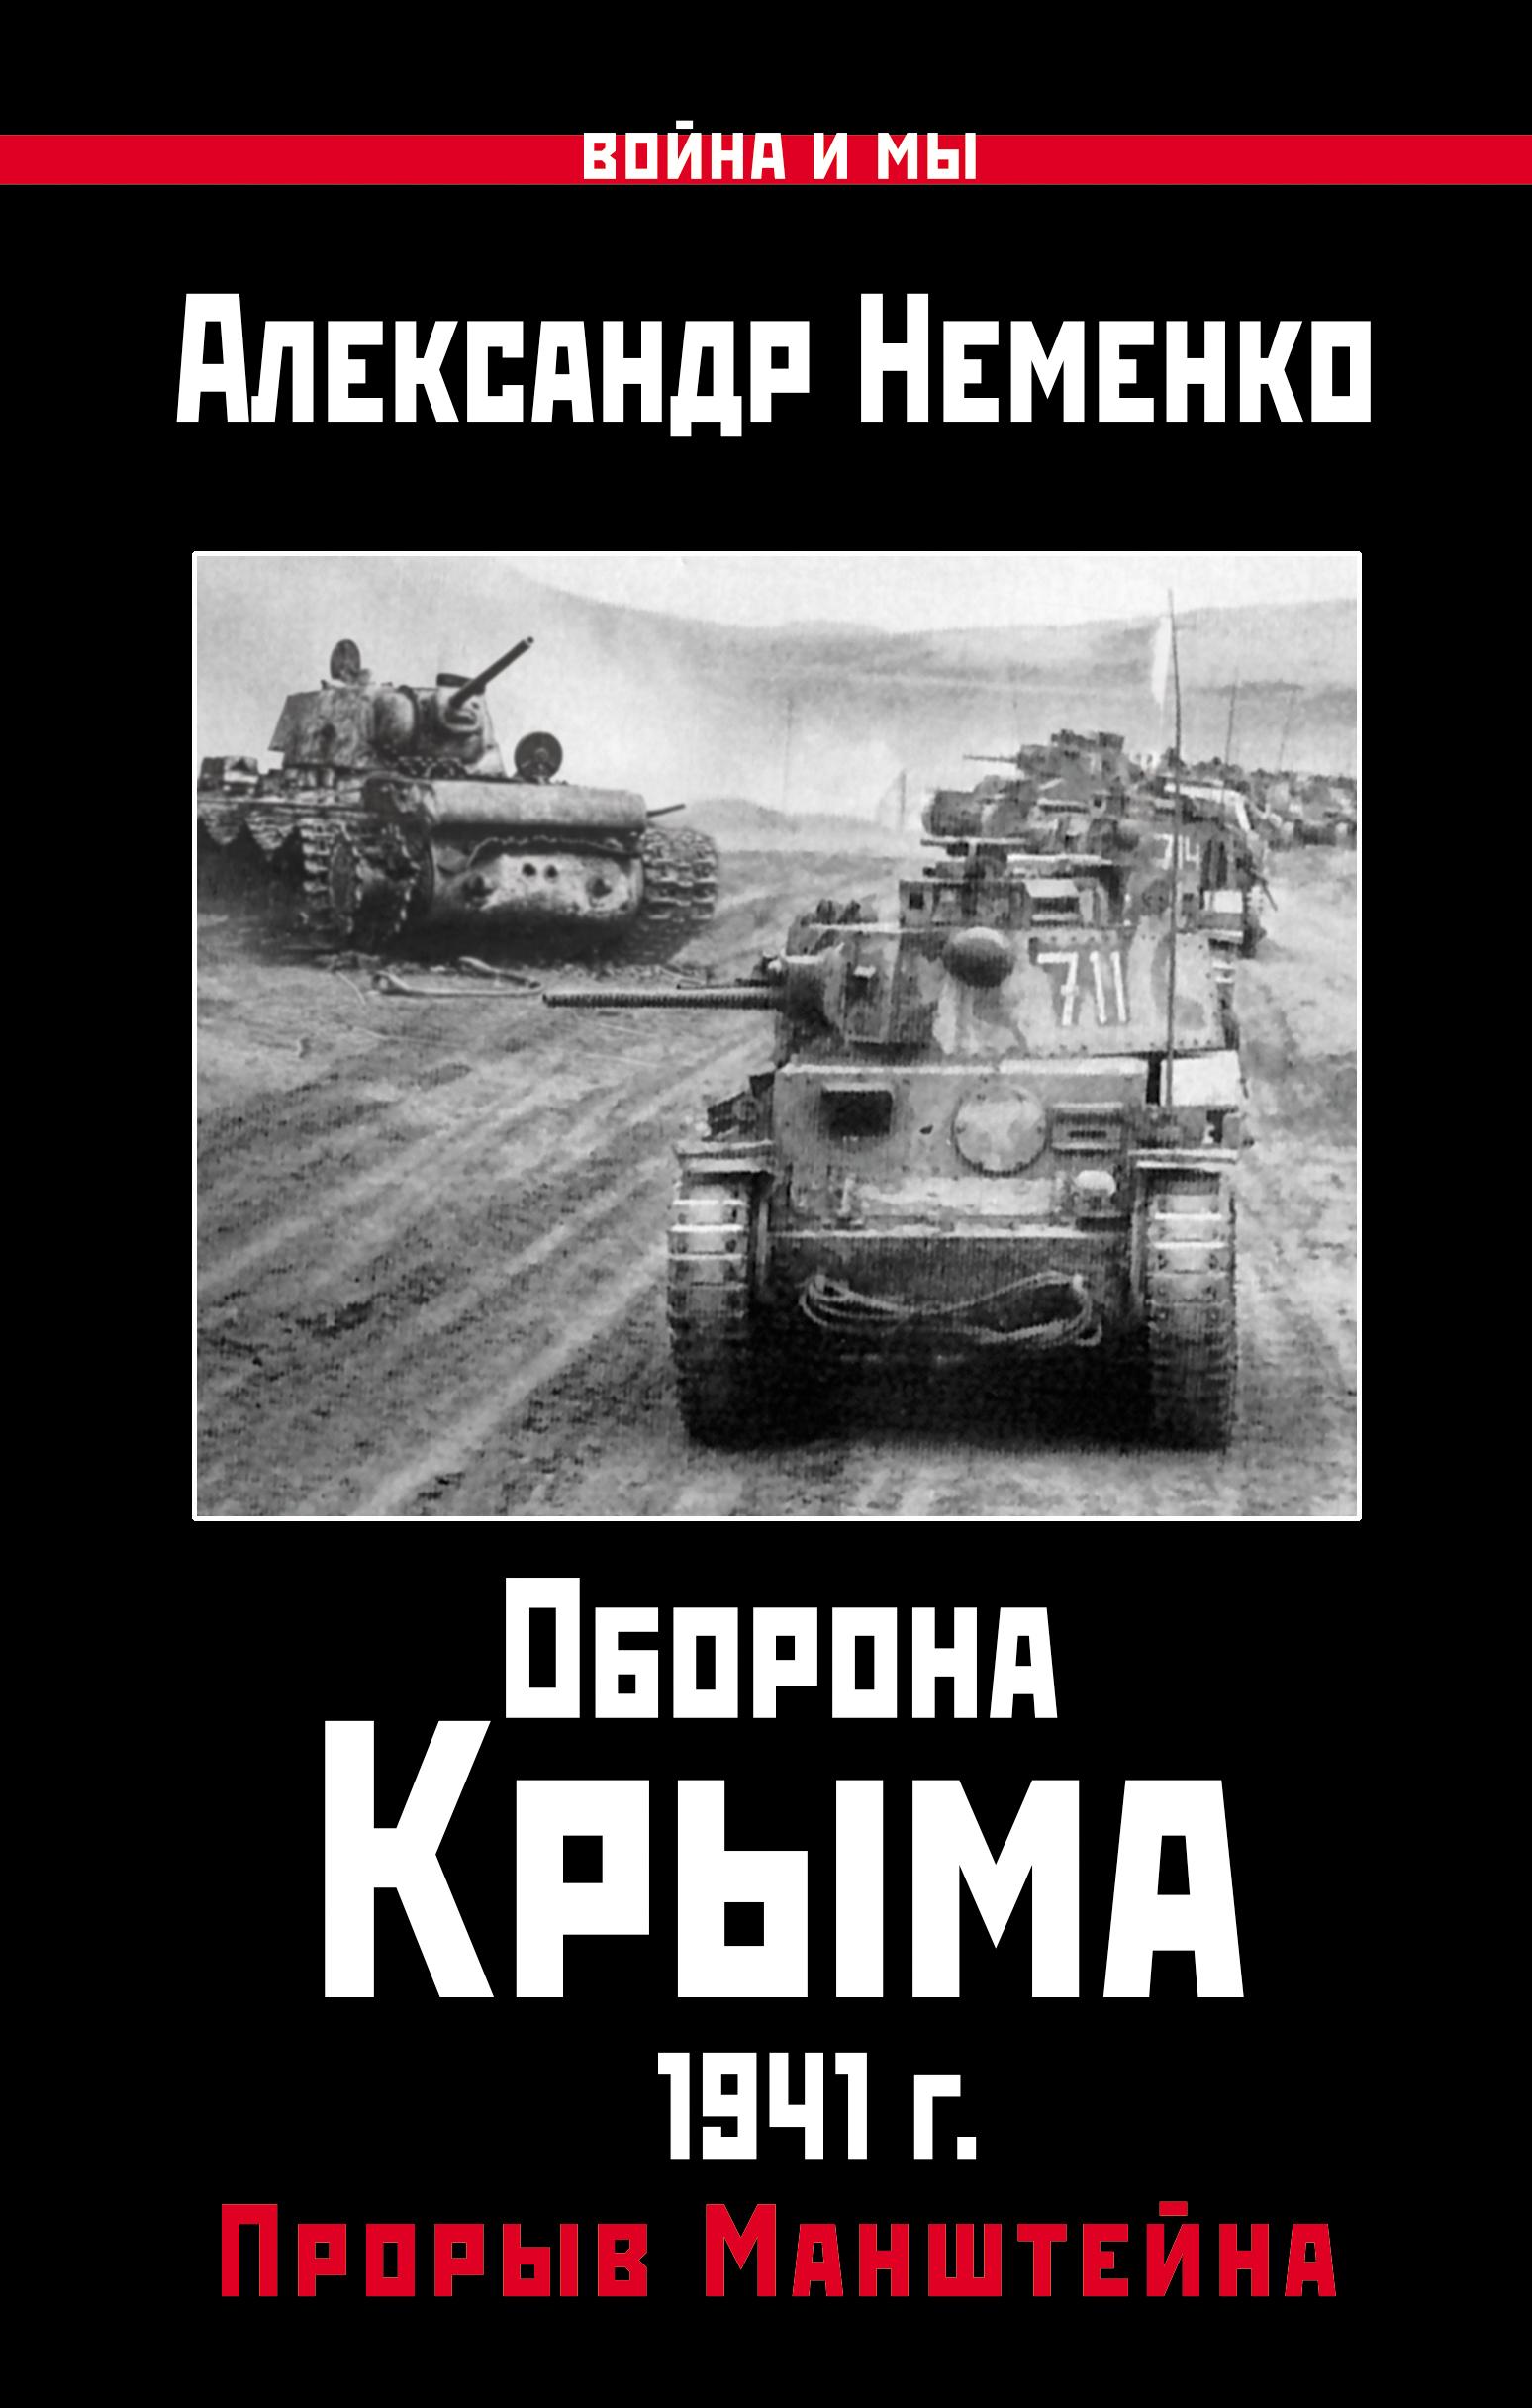 Александр Неменко Оборона Крыма 1941 г. Прорыв Манштейна савицкий г яростный поход танковый ад 1941 года